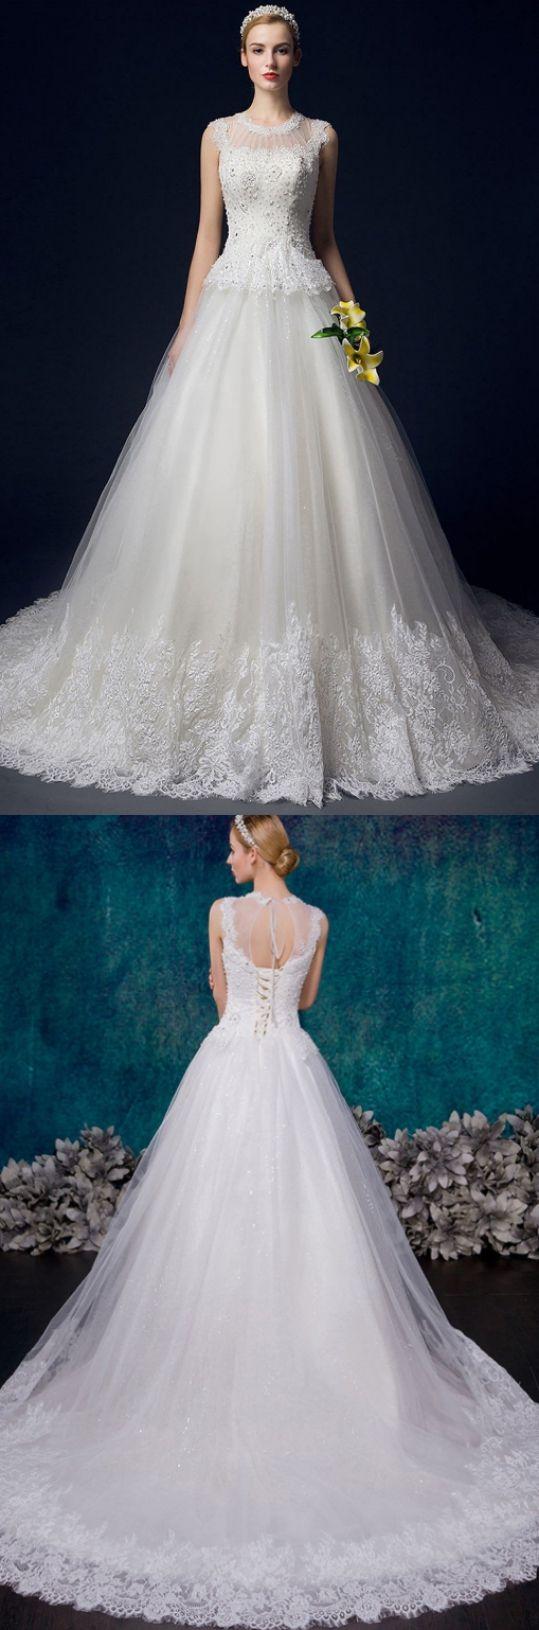 Long wedding dresses gown wedding dresses white wedding dresses